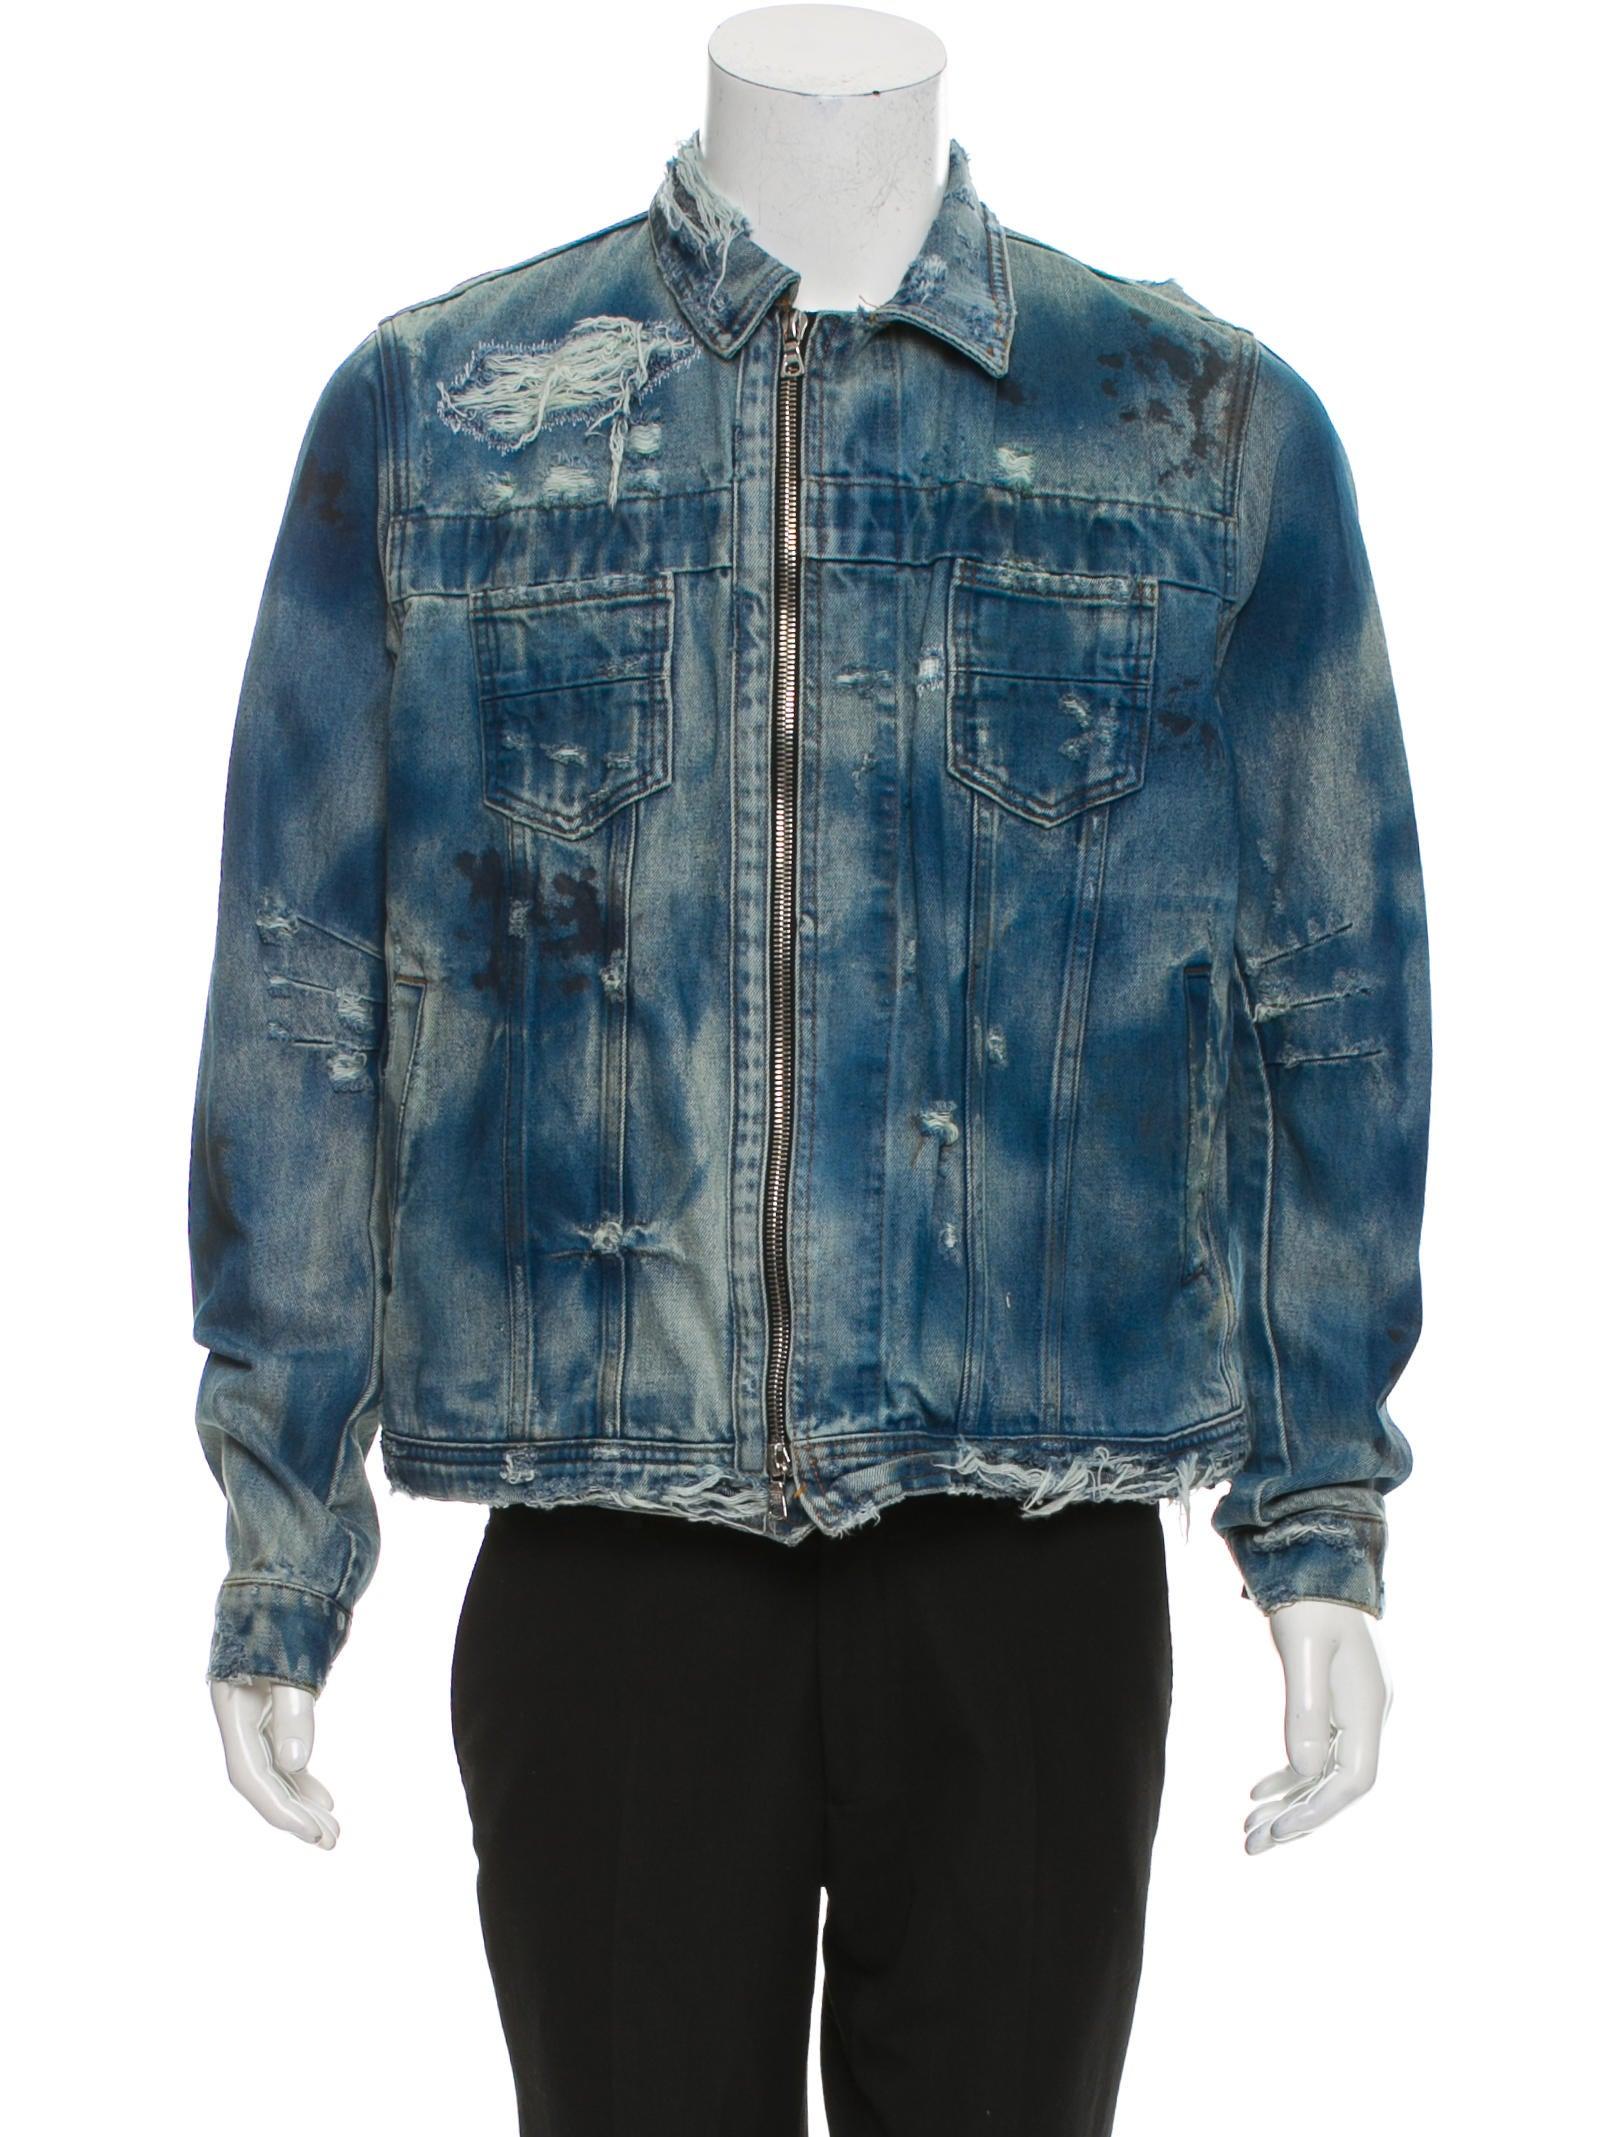 e62deb2554 Amiri Distressed Denim Jacket w  Tags - Clothing - AMIRI20310